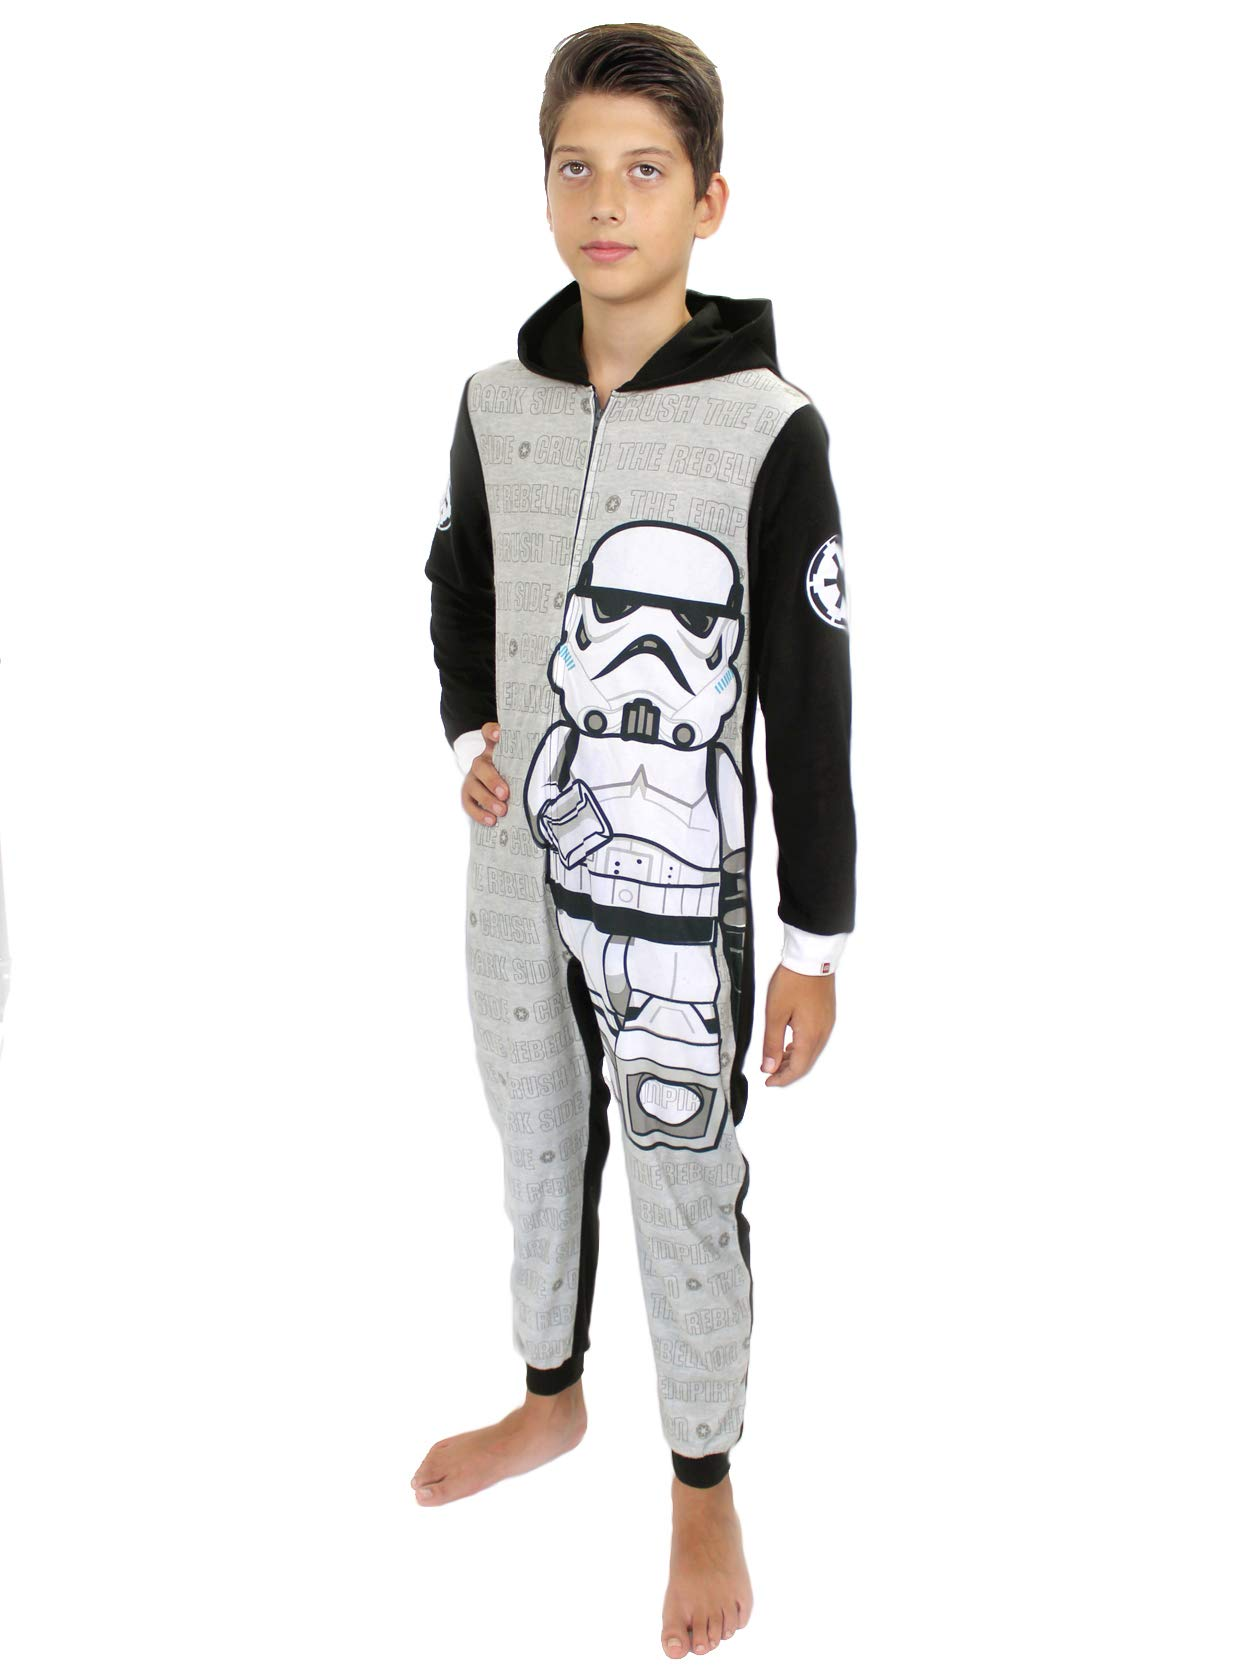 Lego Star Wars Stormtrooper Boys Fleece Hooded Union Suit Pajamas (10-12, Grey/Black)